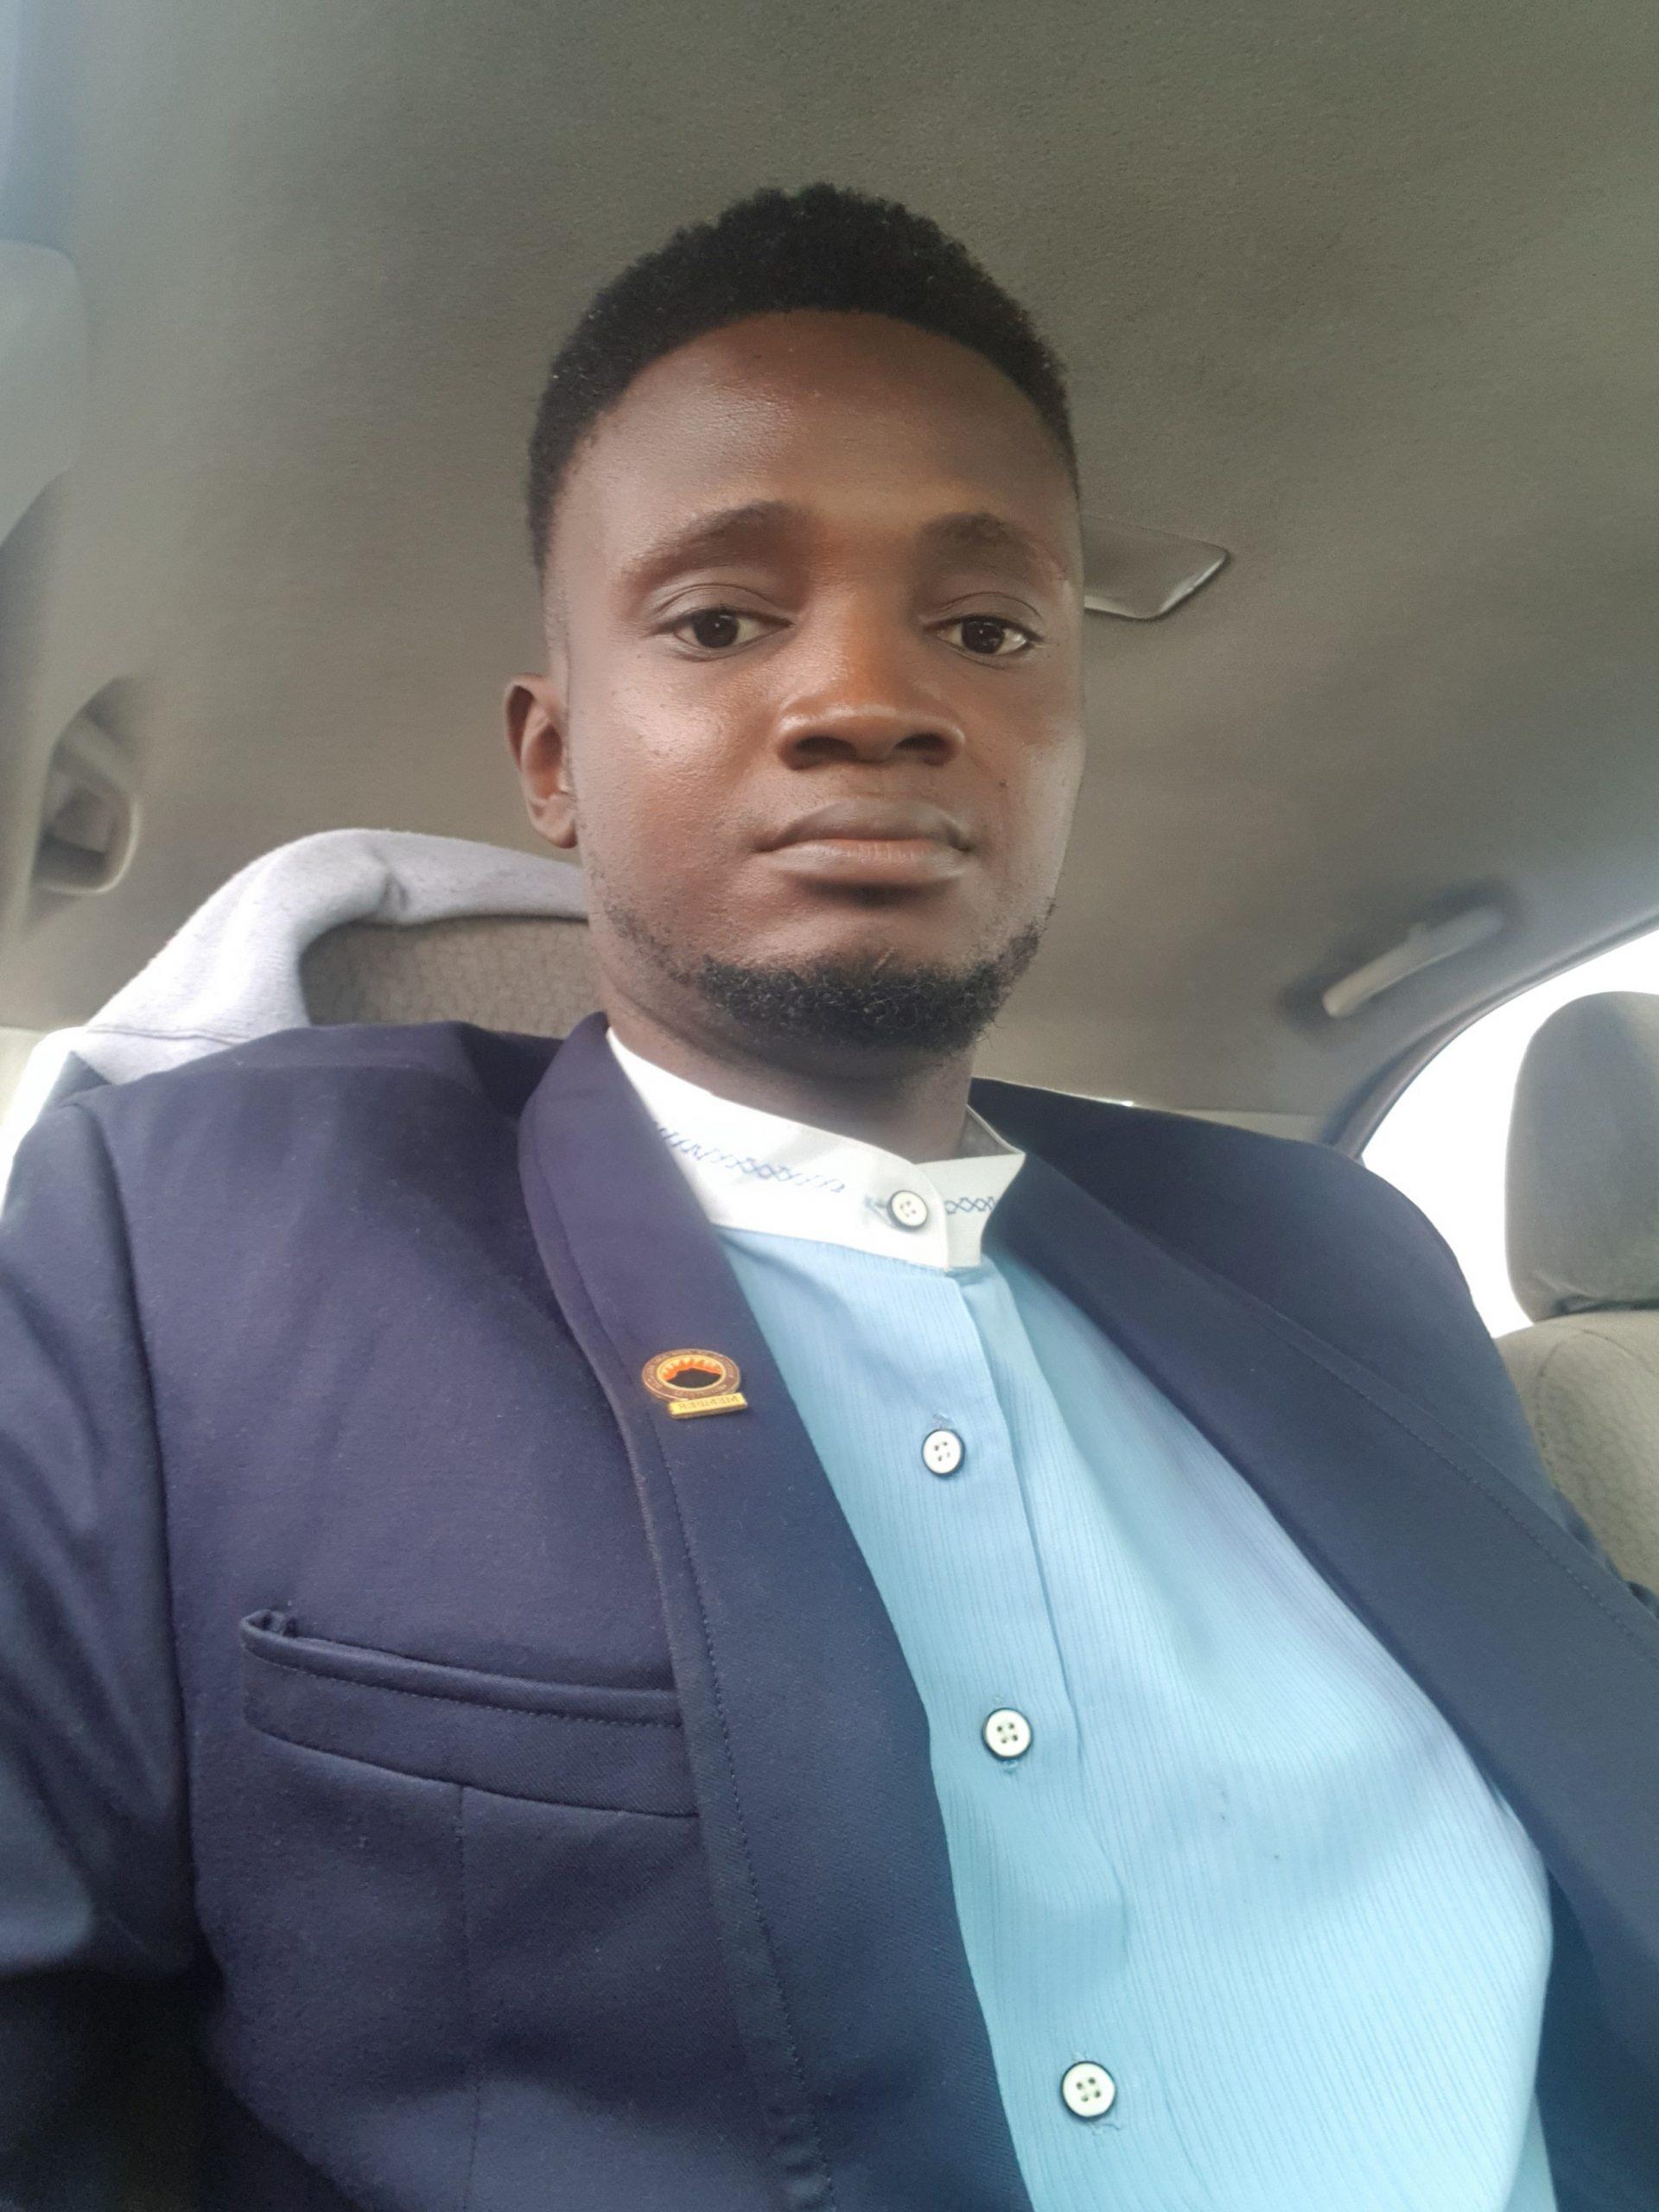 KIKINUELS TRAVELS AND TOUR, Emmanuel ufuoma Okpako, Benin City, Nigeria